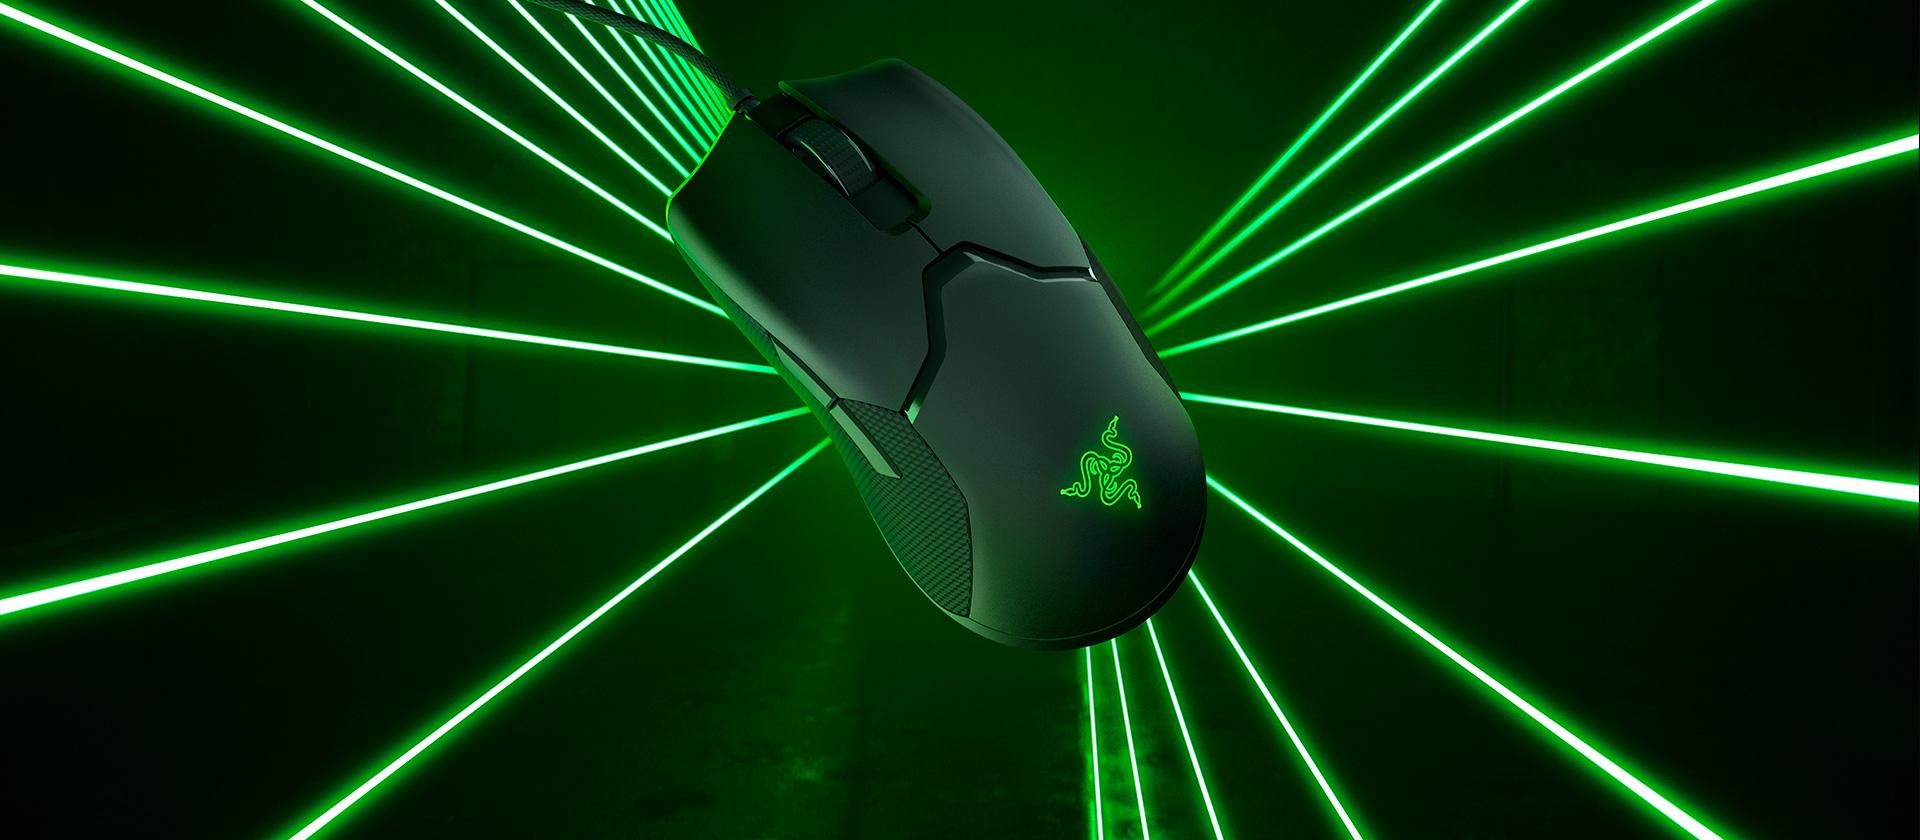 Giới thiệu Chuột chơi game Razer Viper Gaming